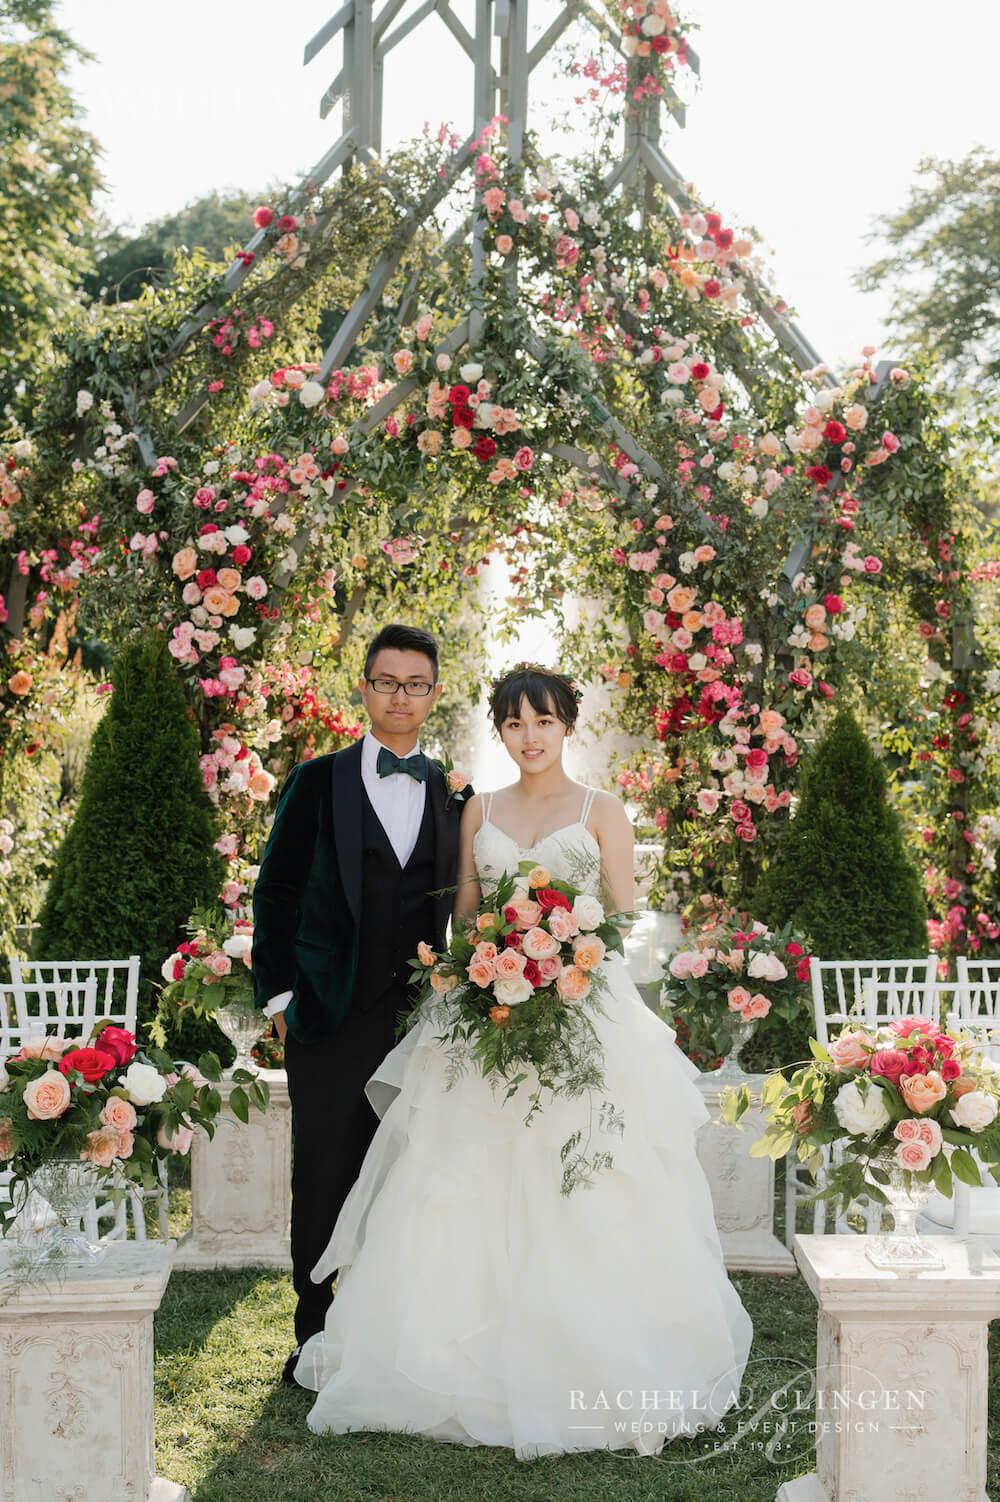 Weddings At Casa Loma Archives Wedding Decor Toronto Rachel A